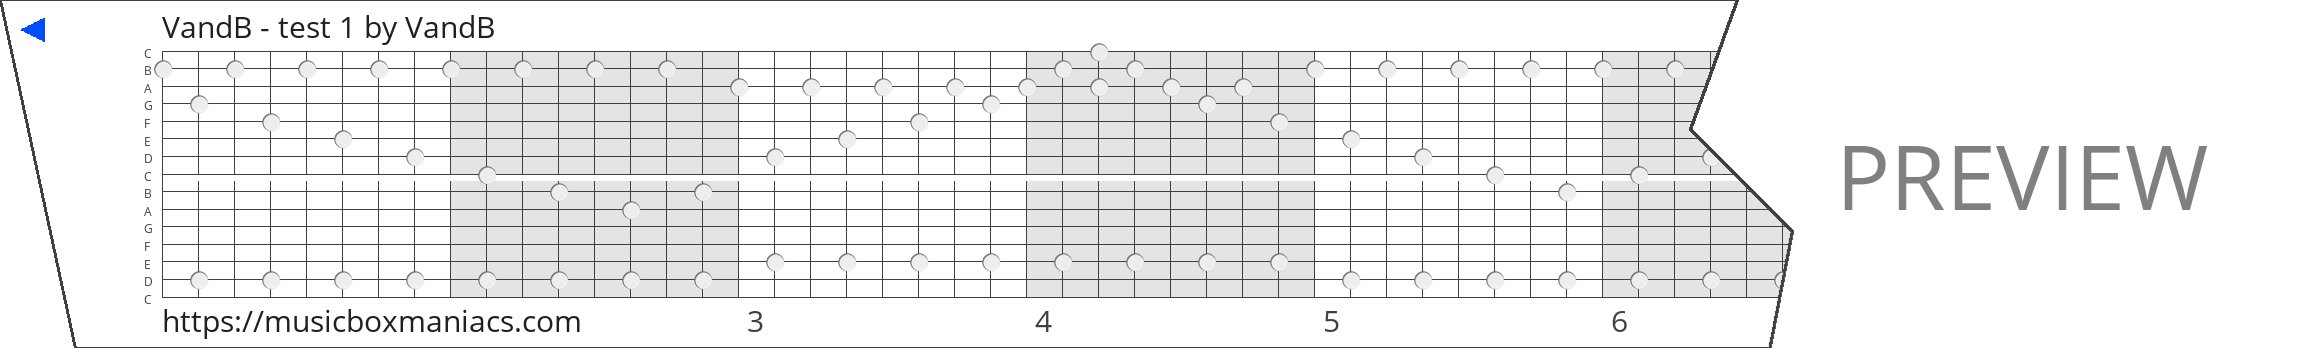 VandB - test 1 15 note music box paper strip